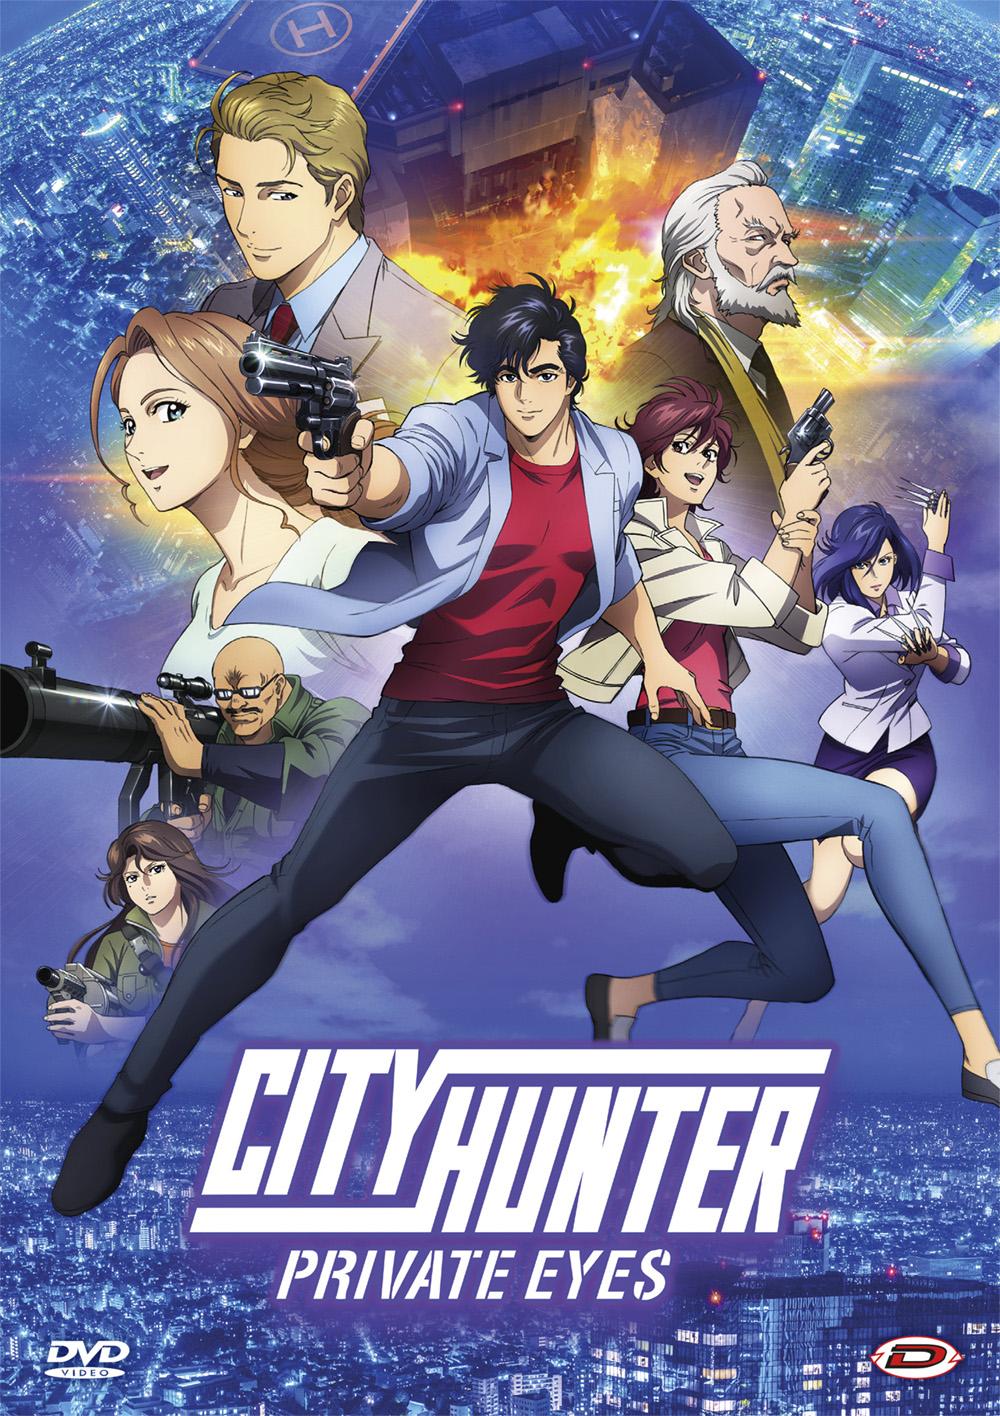 CITY HUNTER - PRIVATE EYES (DVD)